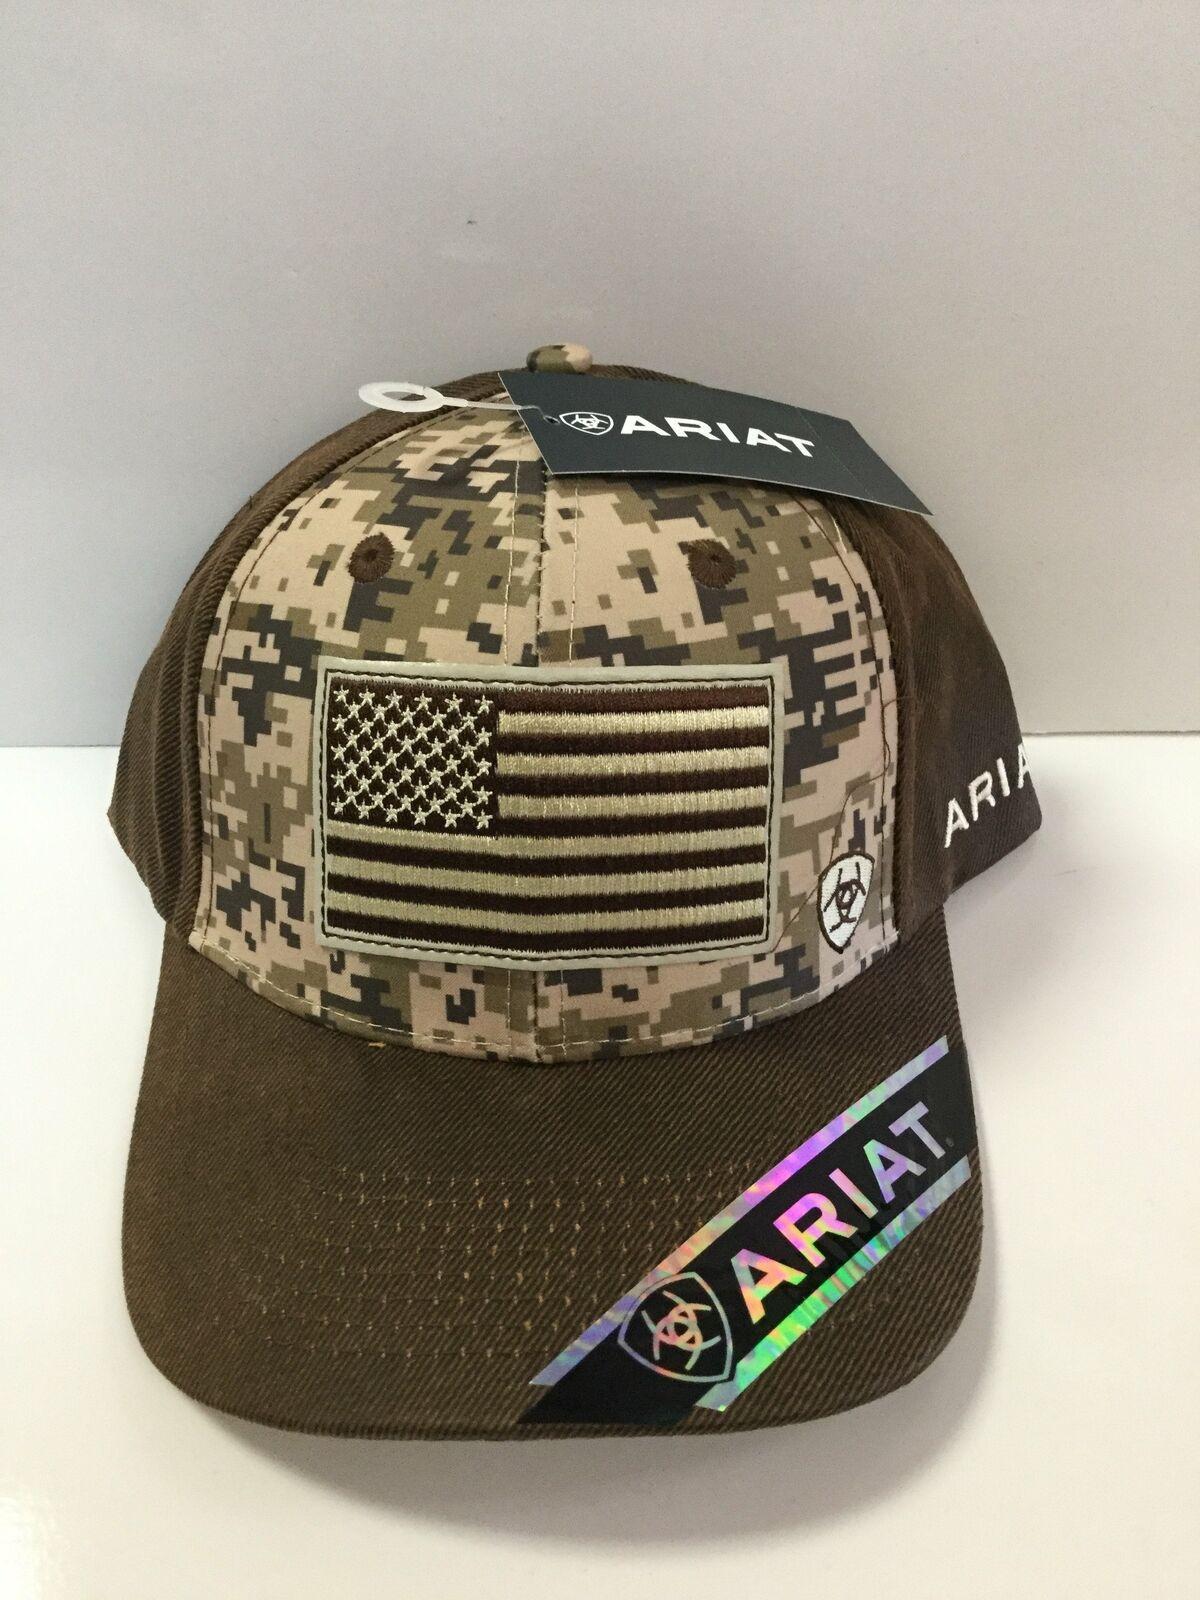 dea64aff37ccc Ariat Mens Hat Baseball Cap Logo Snapback USA Flag Camo 15094156 for ...